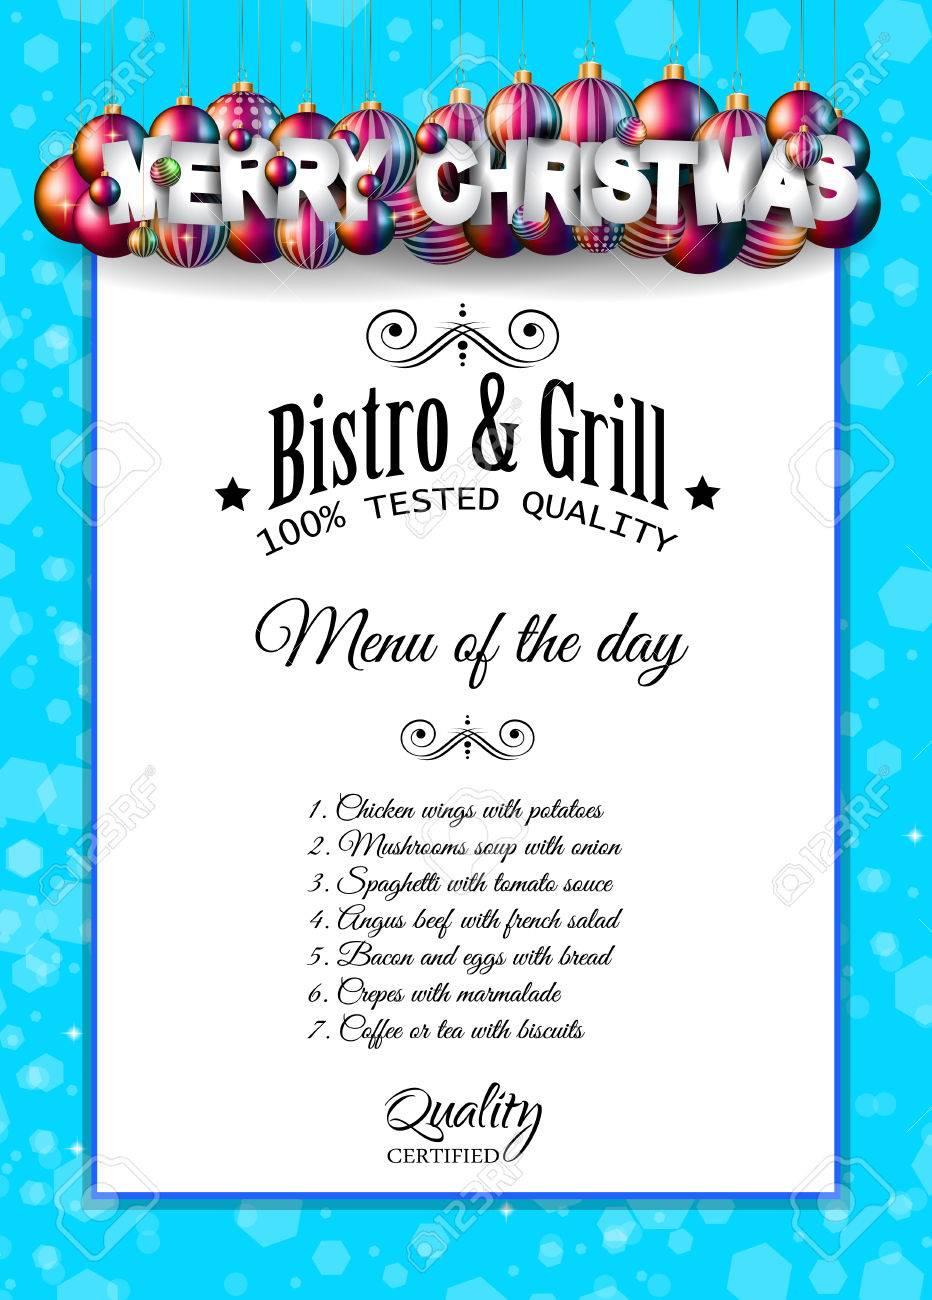 Dinner menu templates – 36+ free word, pdf, psd, eps, indesign.